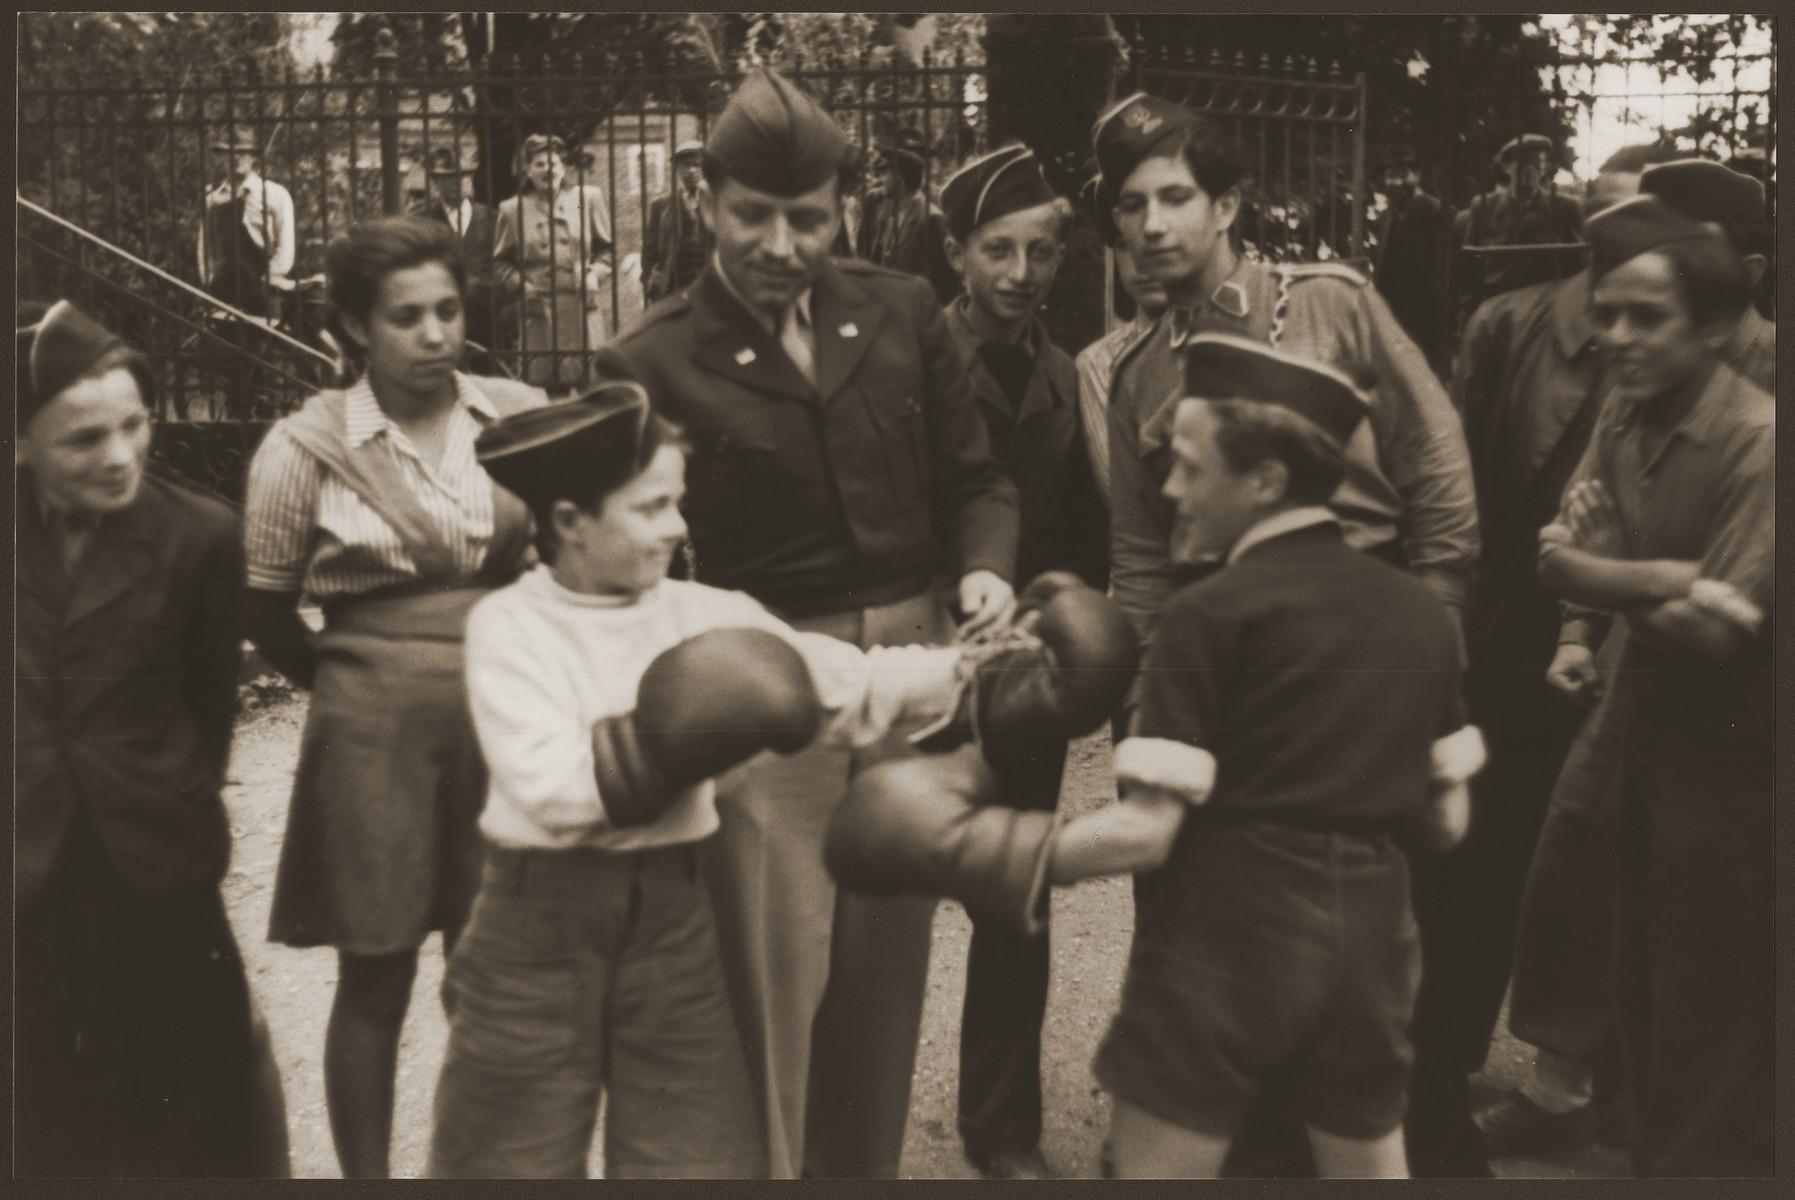 Jewish children boxing at the Vaad Hatzala sponsored Jabotinsky Children's Home.  Among those pictured is Izio Gerber (far left).